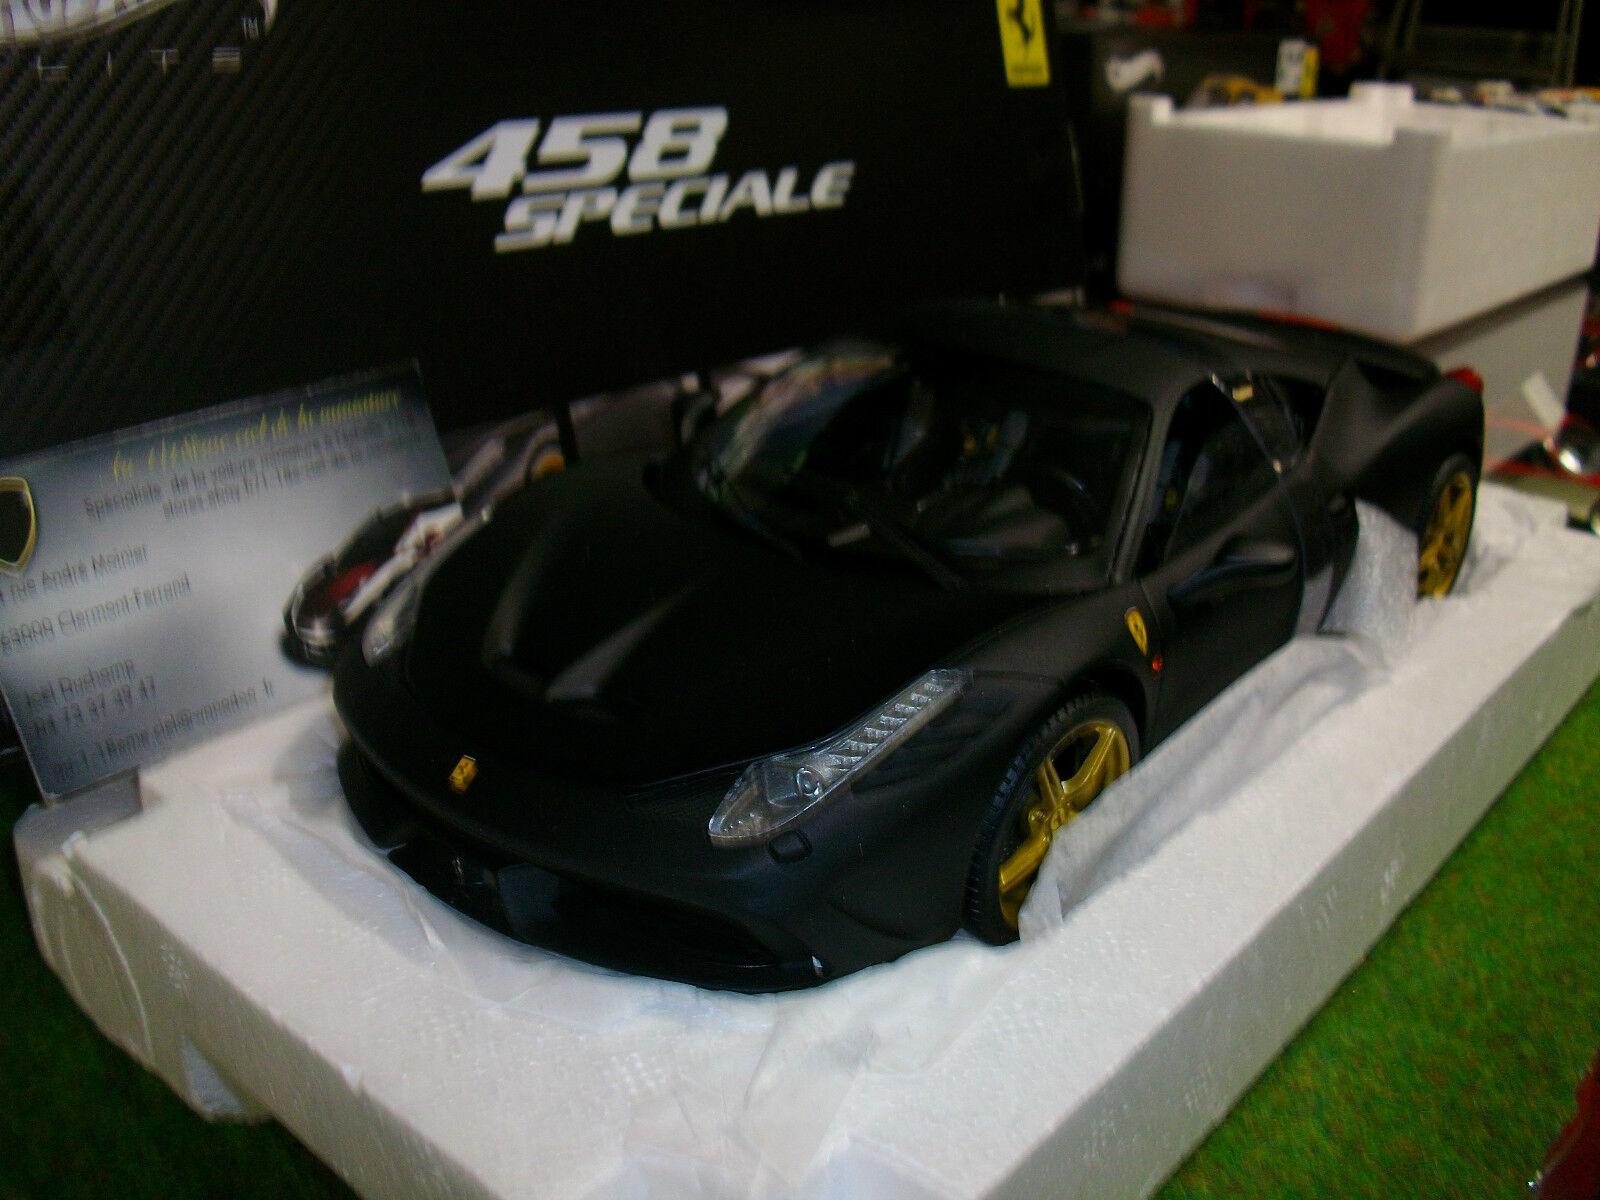 FERRARI 458 SPECIAL noir matt au 1 18 d HOT WHEELS ELITE BLY33 voiture miniature